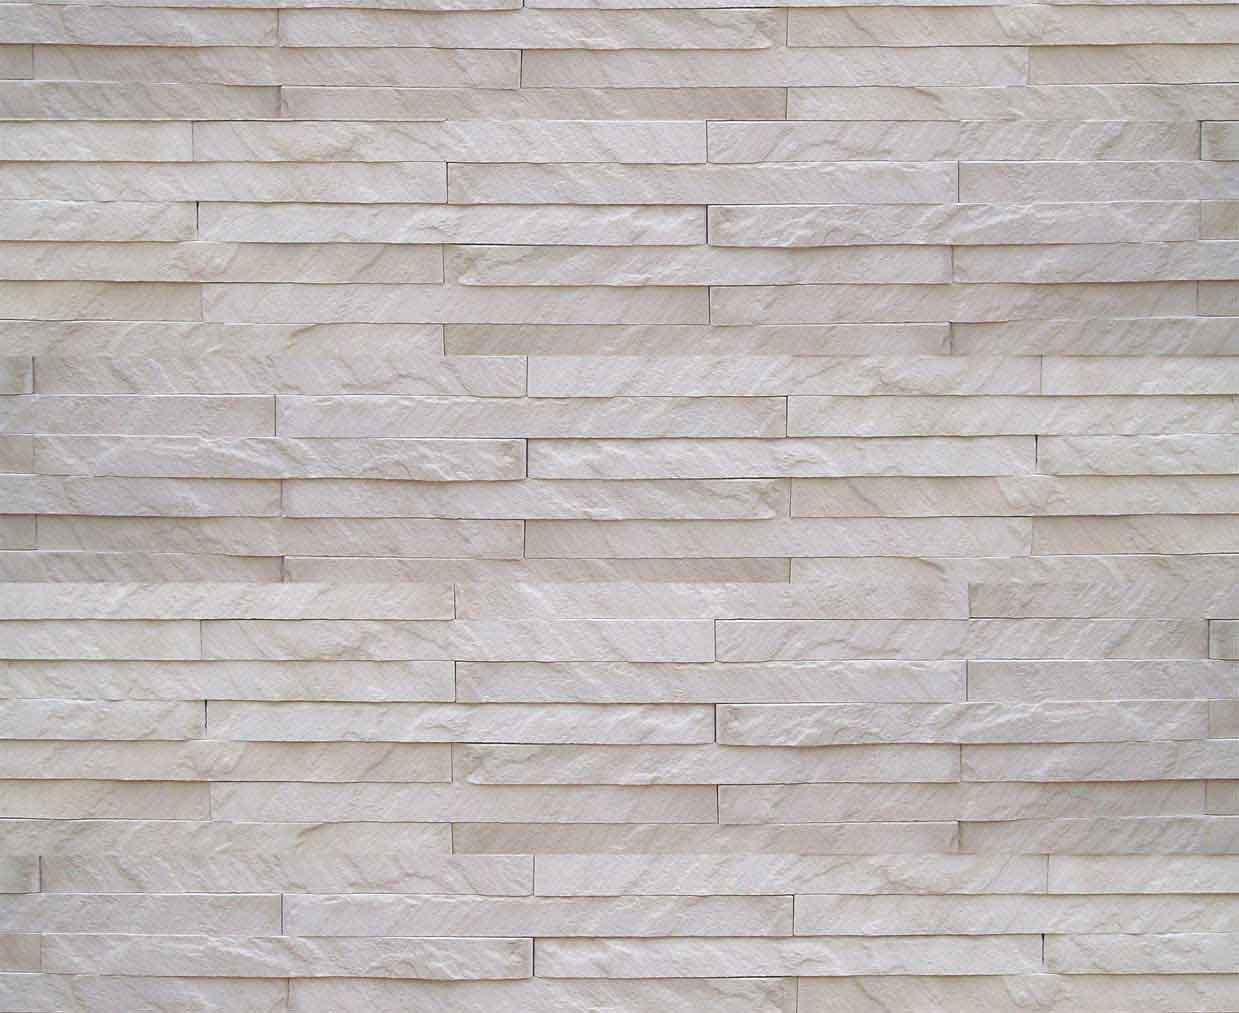 General textura gt gt laja piedra panel gt no consigo - Textura pared ...